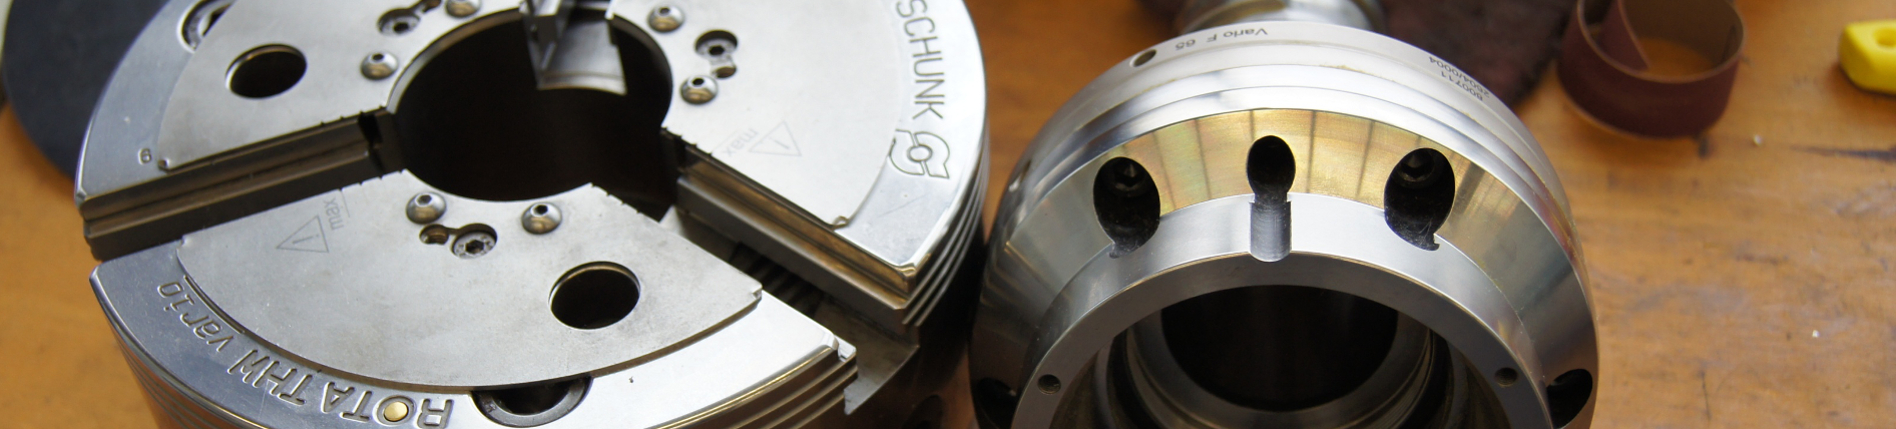 Maschinen Gerlitz Maschinen Vertrieb